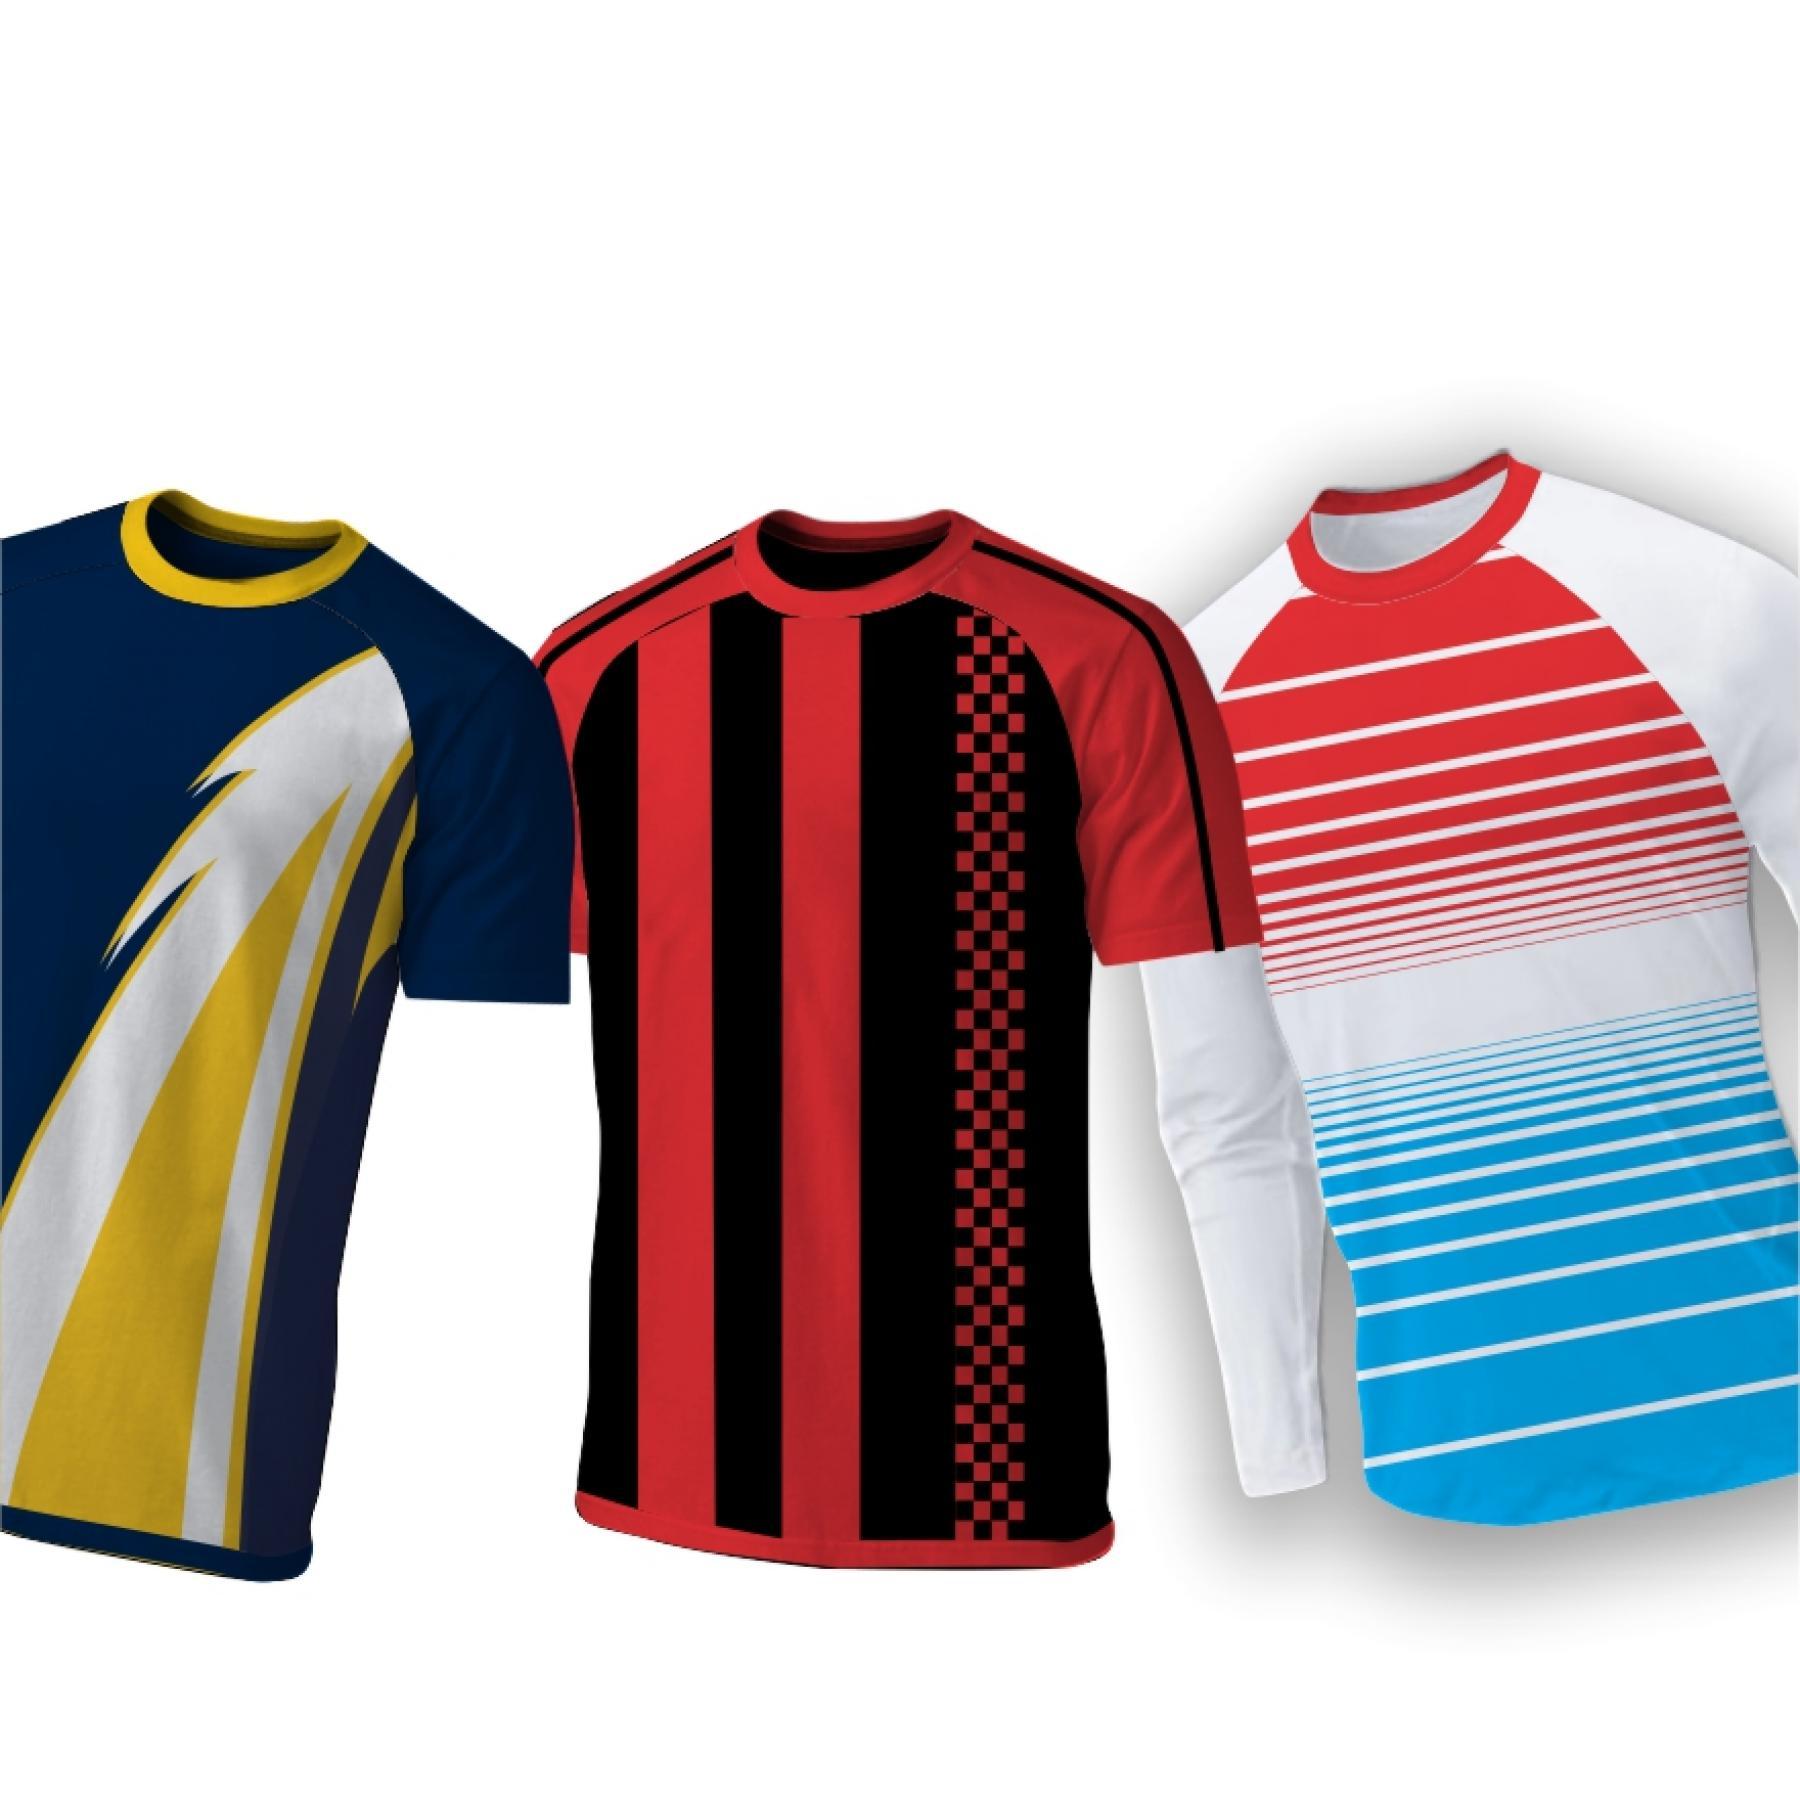 T-shirts Sublimated